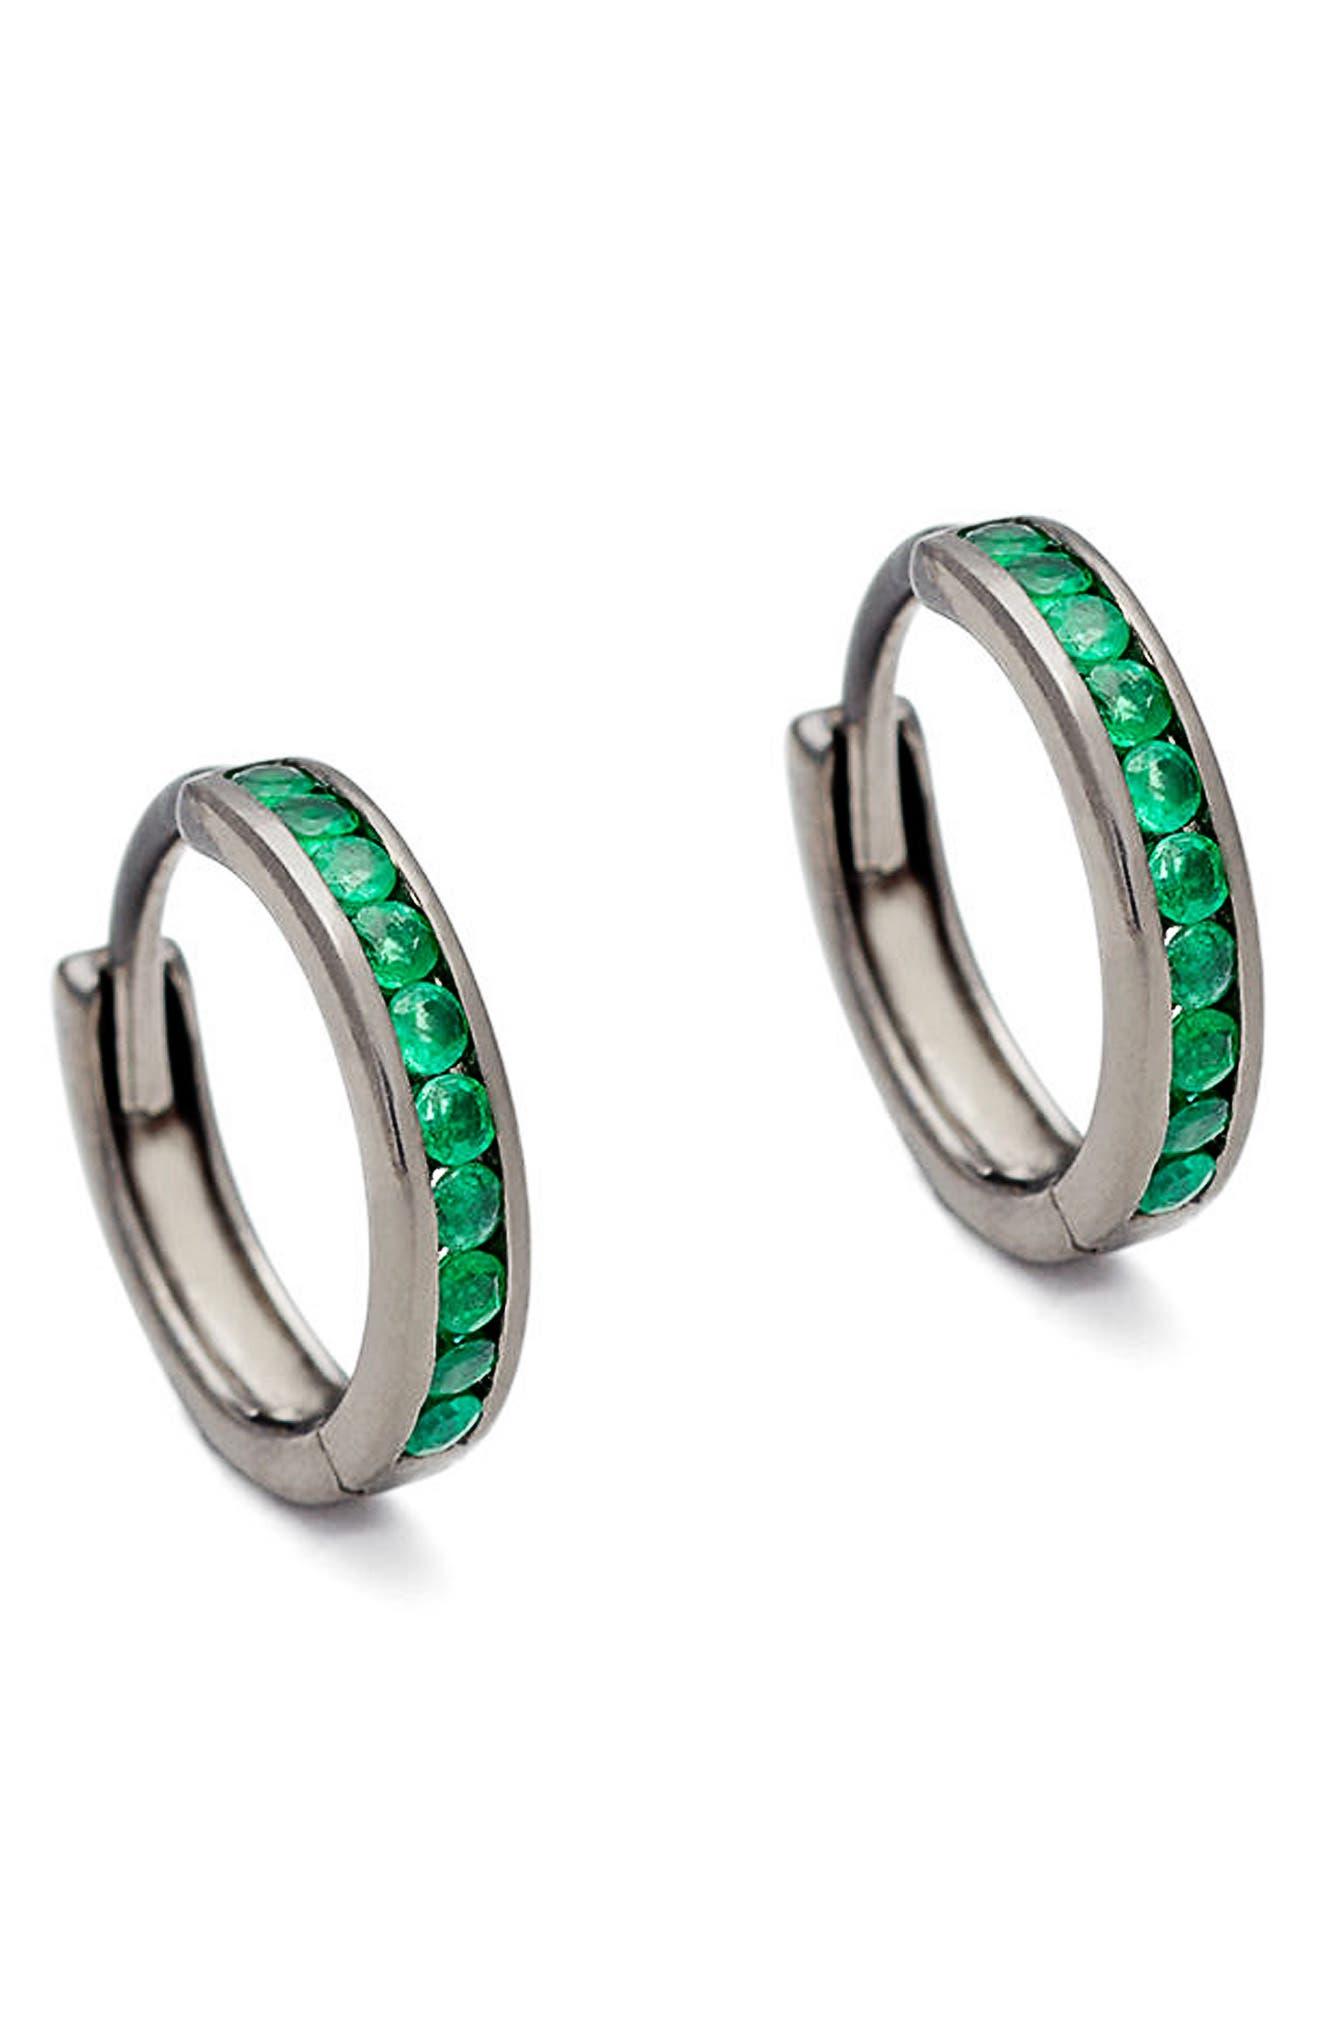 Licol Emerald Hoop Earrings,                             Main thumbnail 1, color,                             340